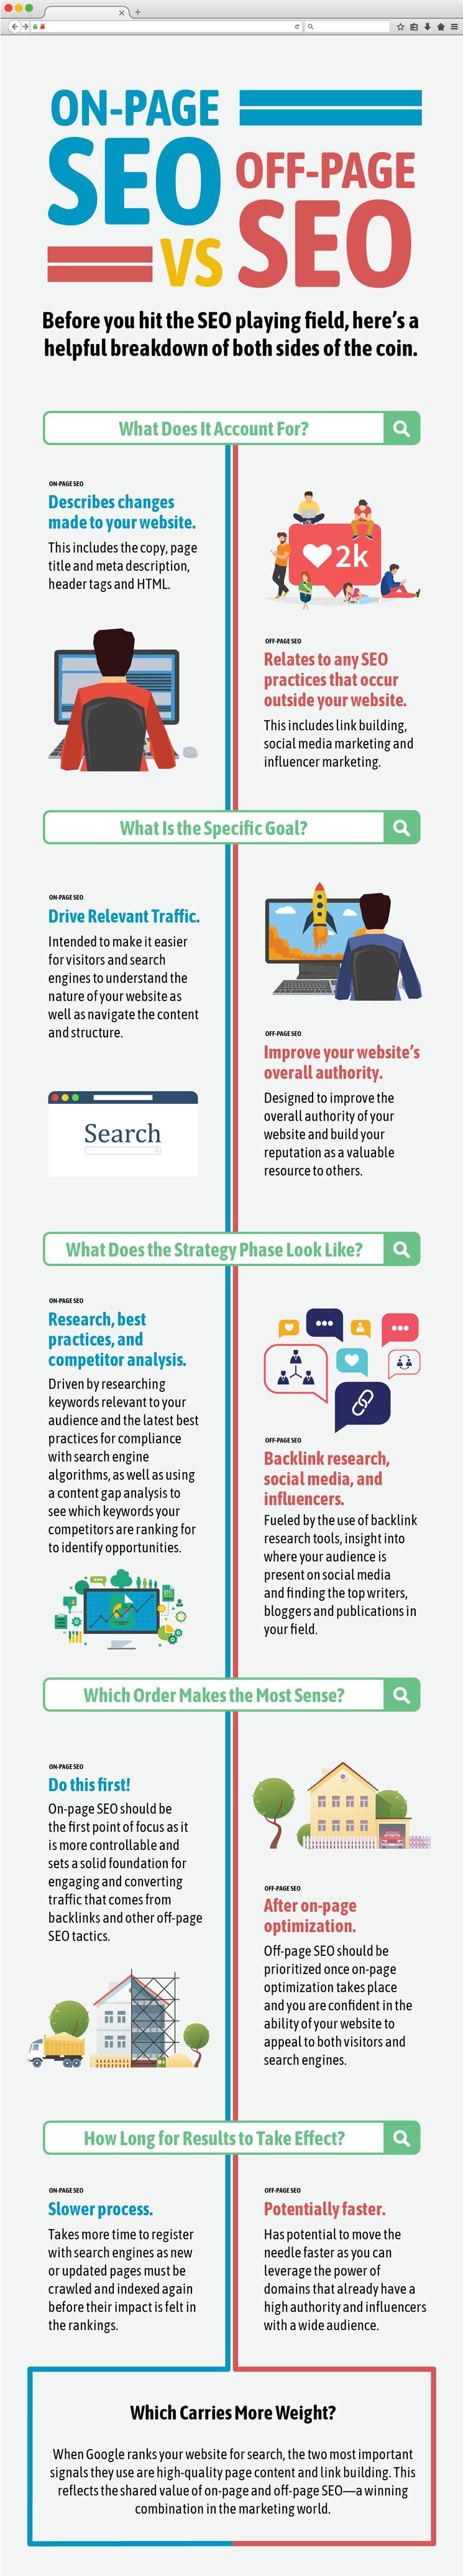 Infografia de SEO - On-Page SEO vs Off-Page SEO